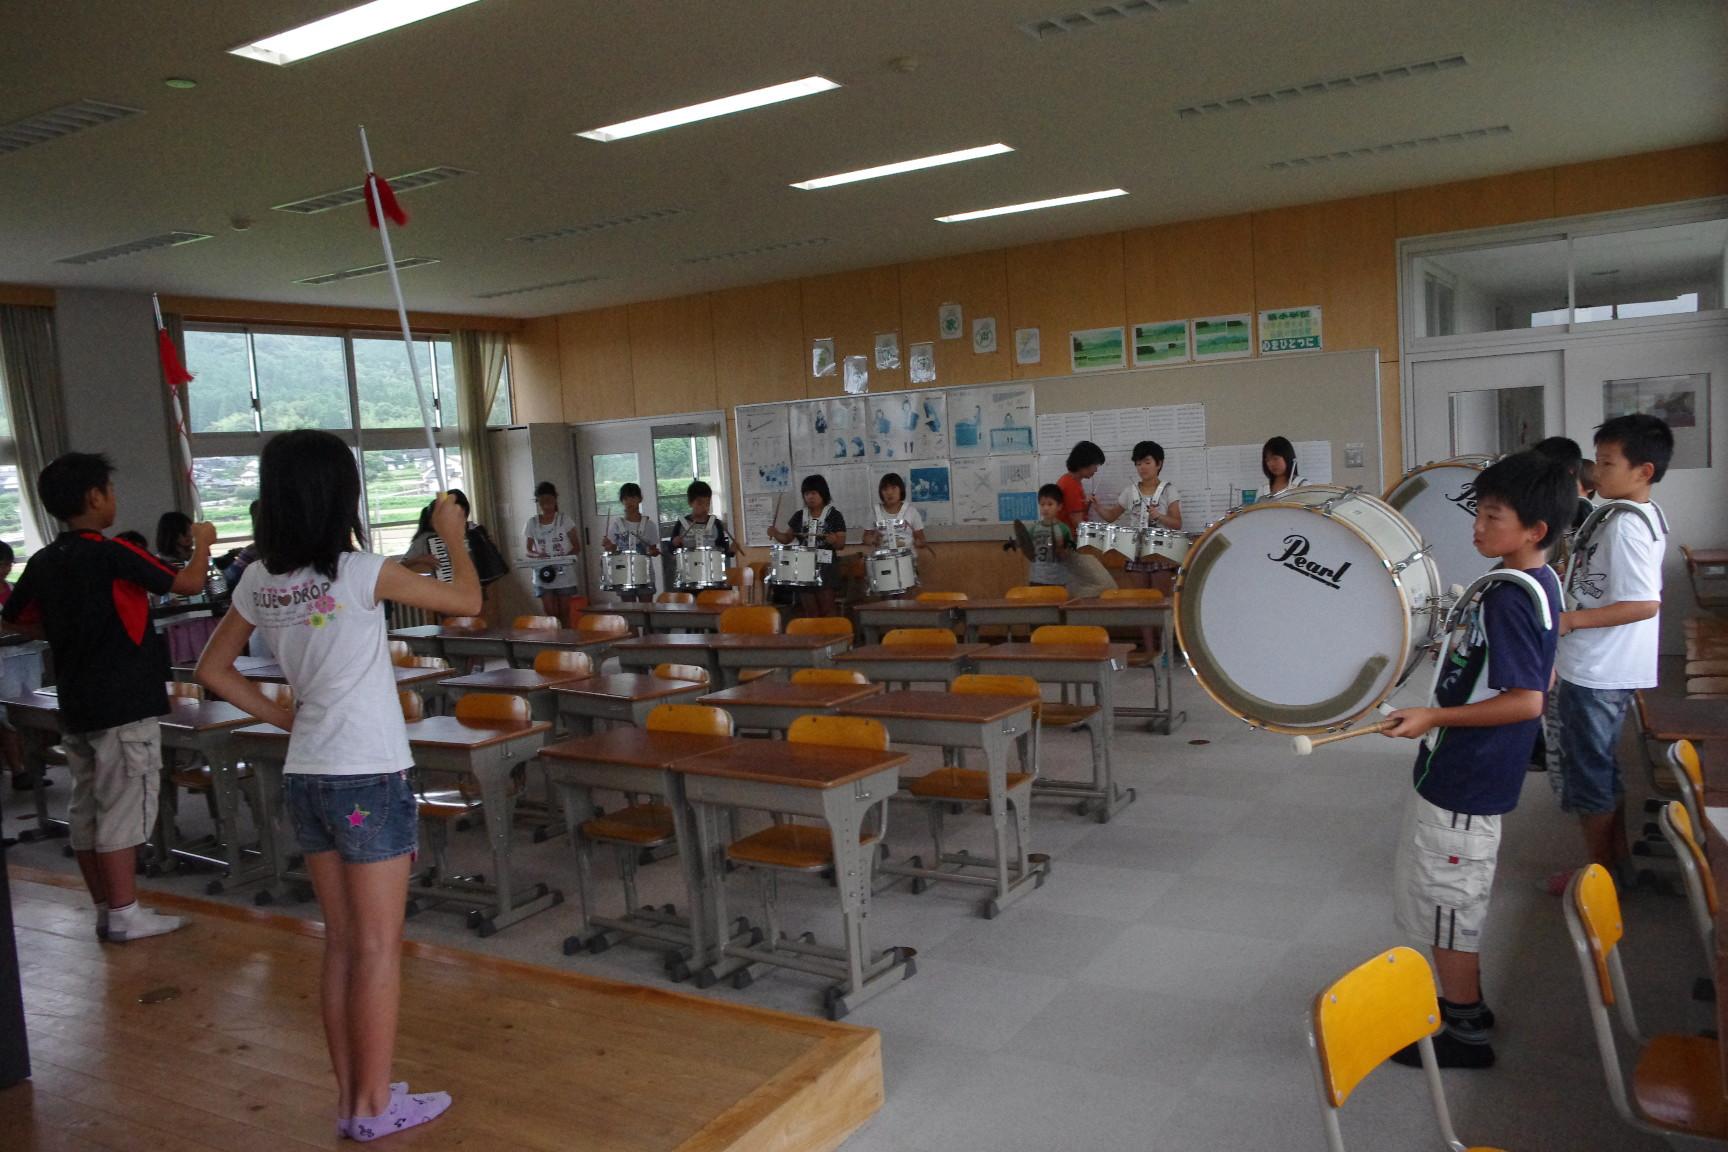 小学校の音楽練習